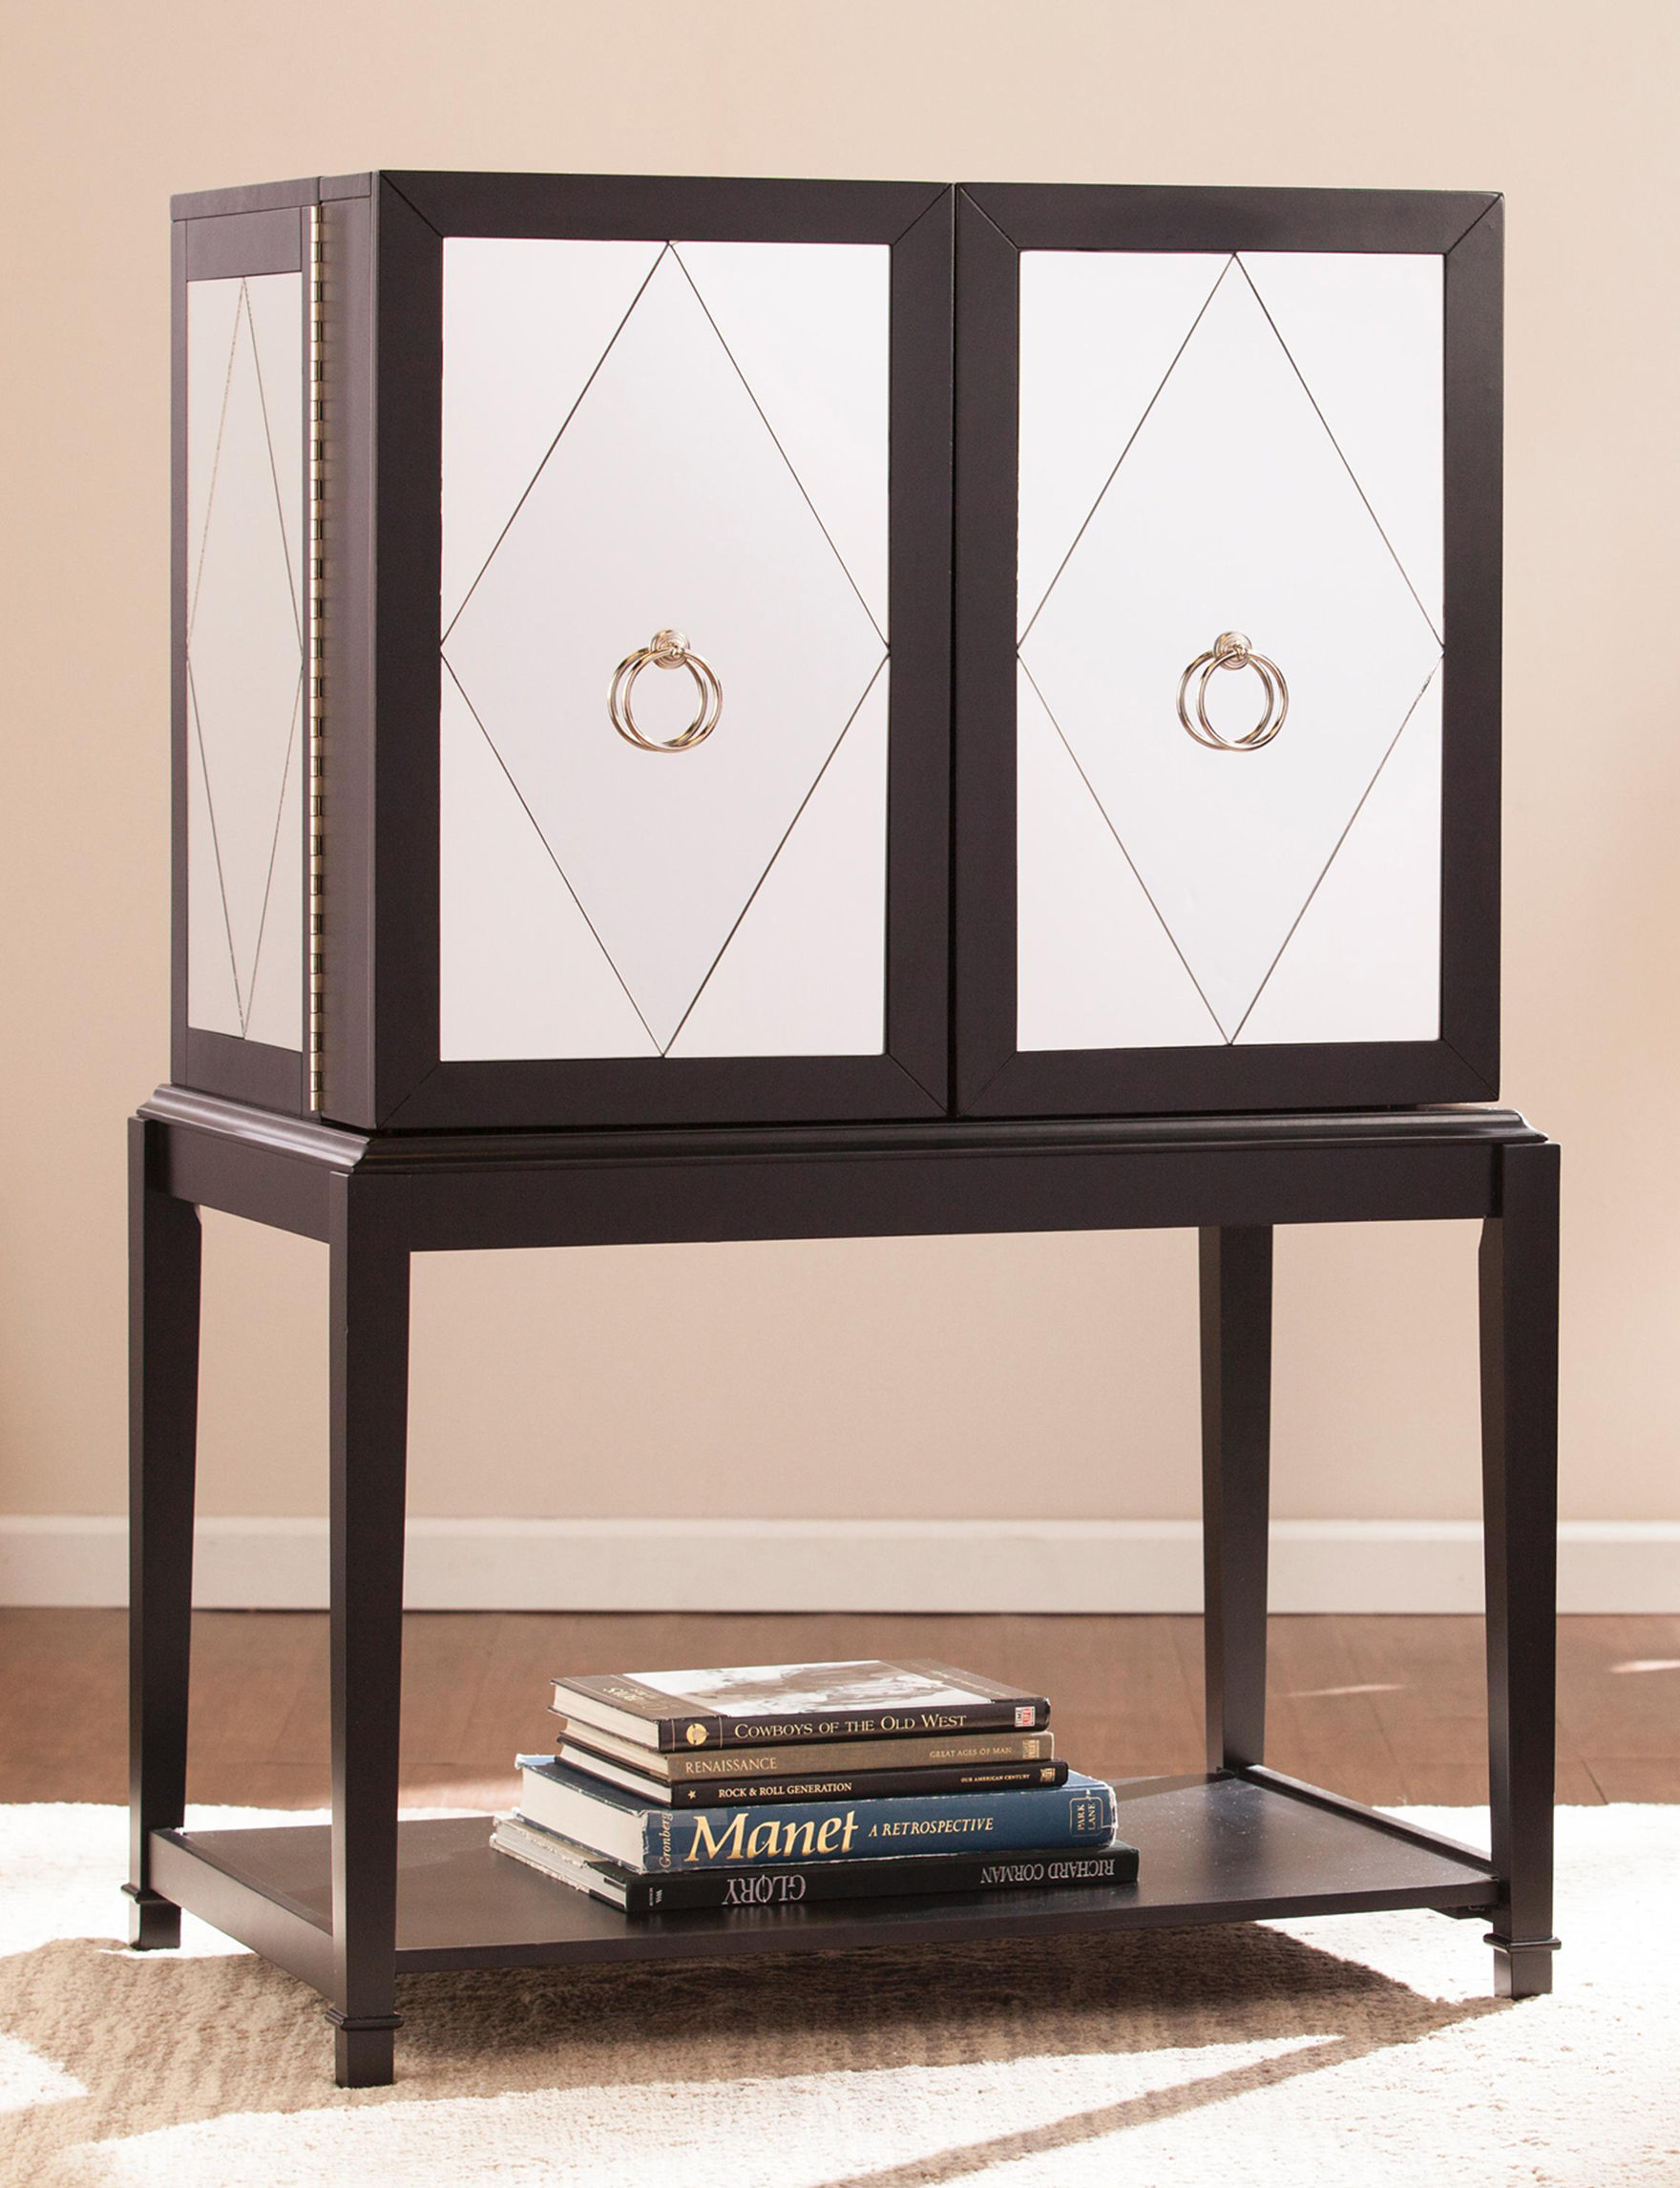 Southern Enterprises Black Bar & Wine Storage Wine Racks Home Accents Kitchen & Dining Furniture Living Room Furniture